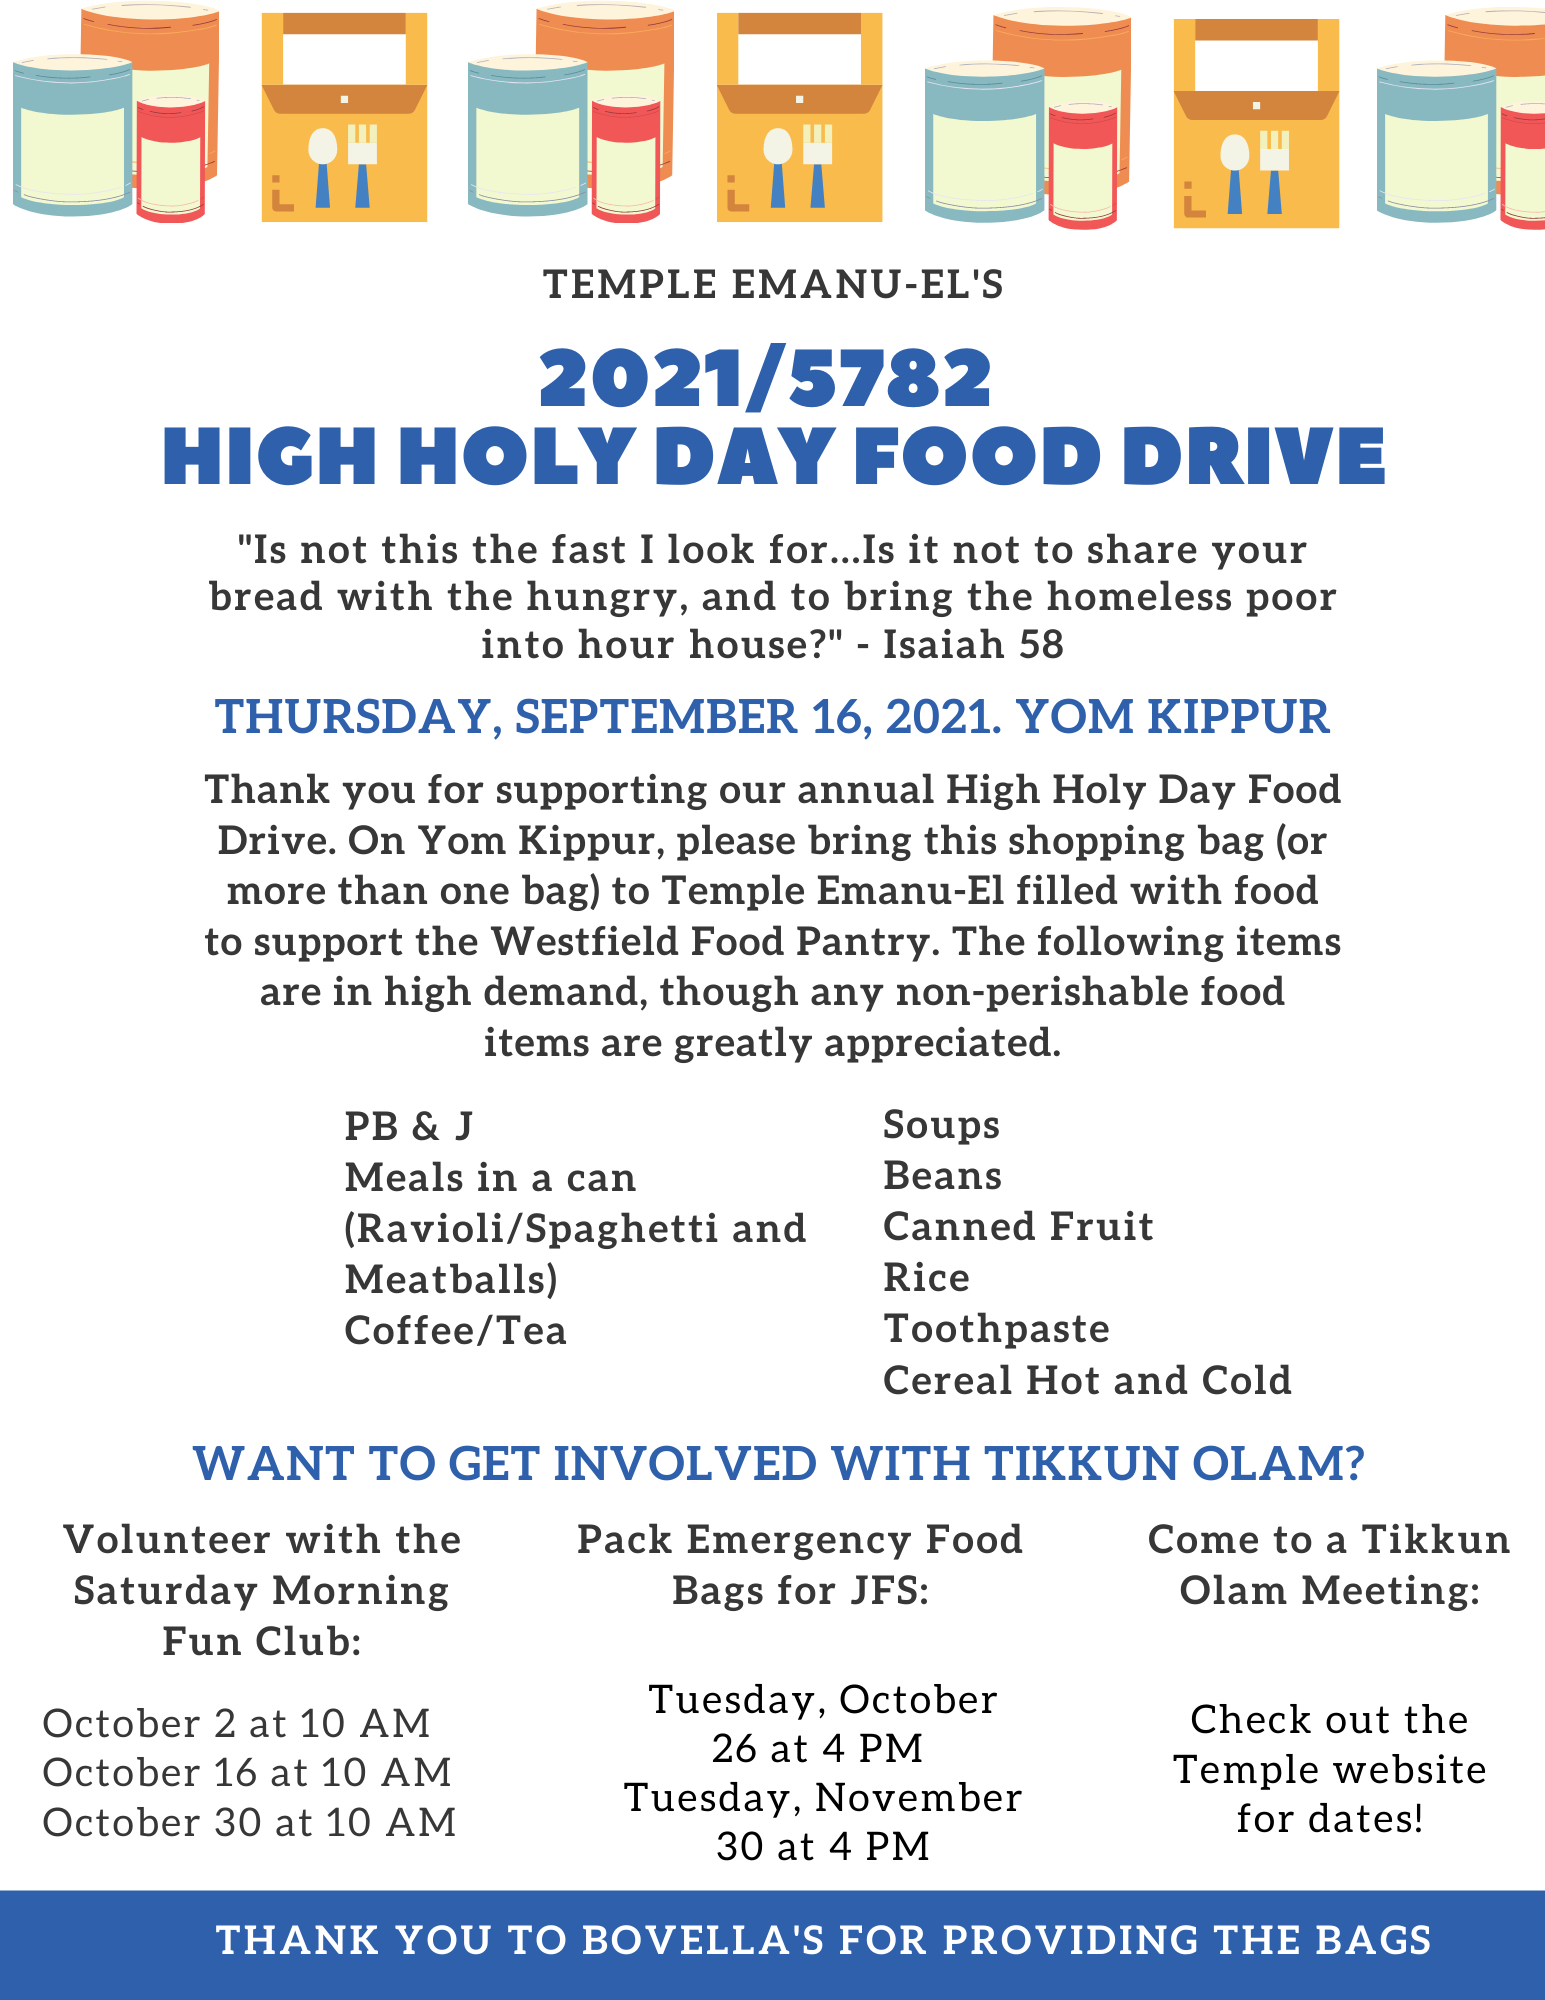 HHD Food Drive 5782